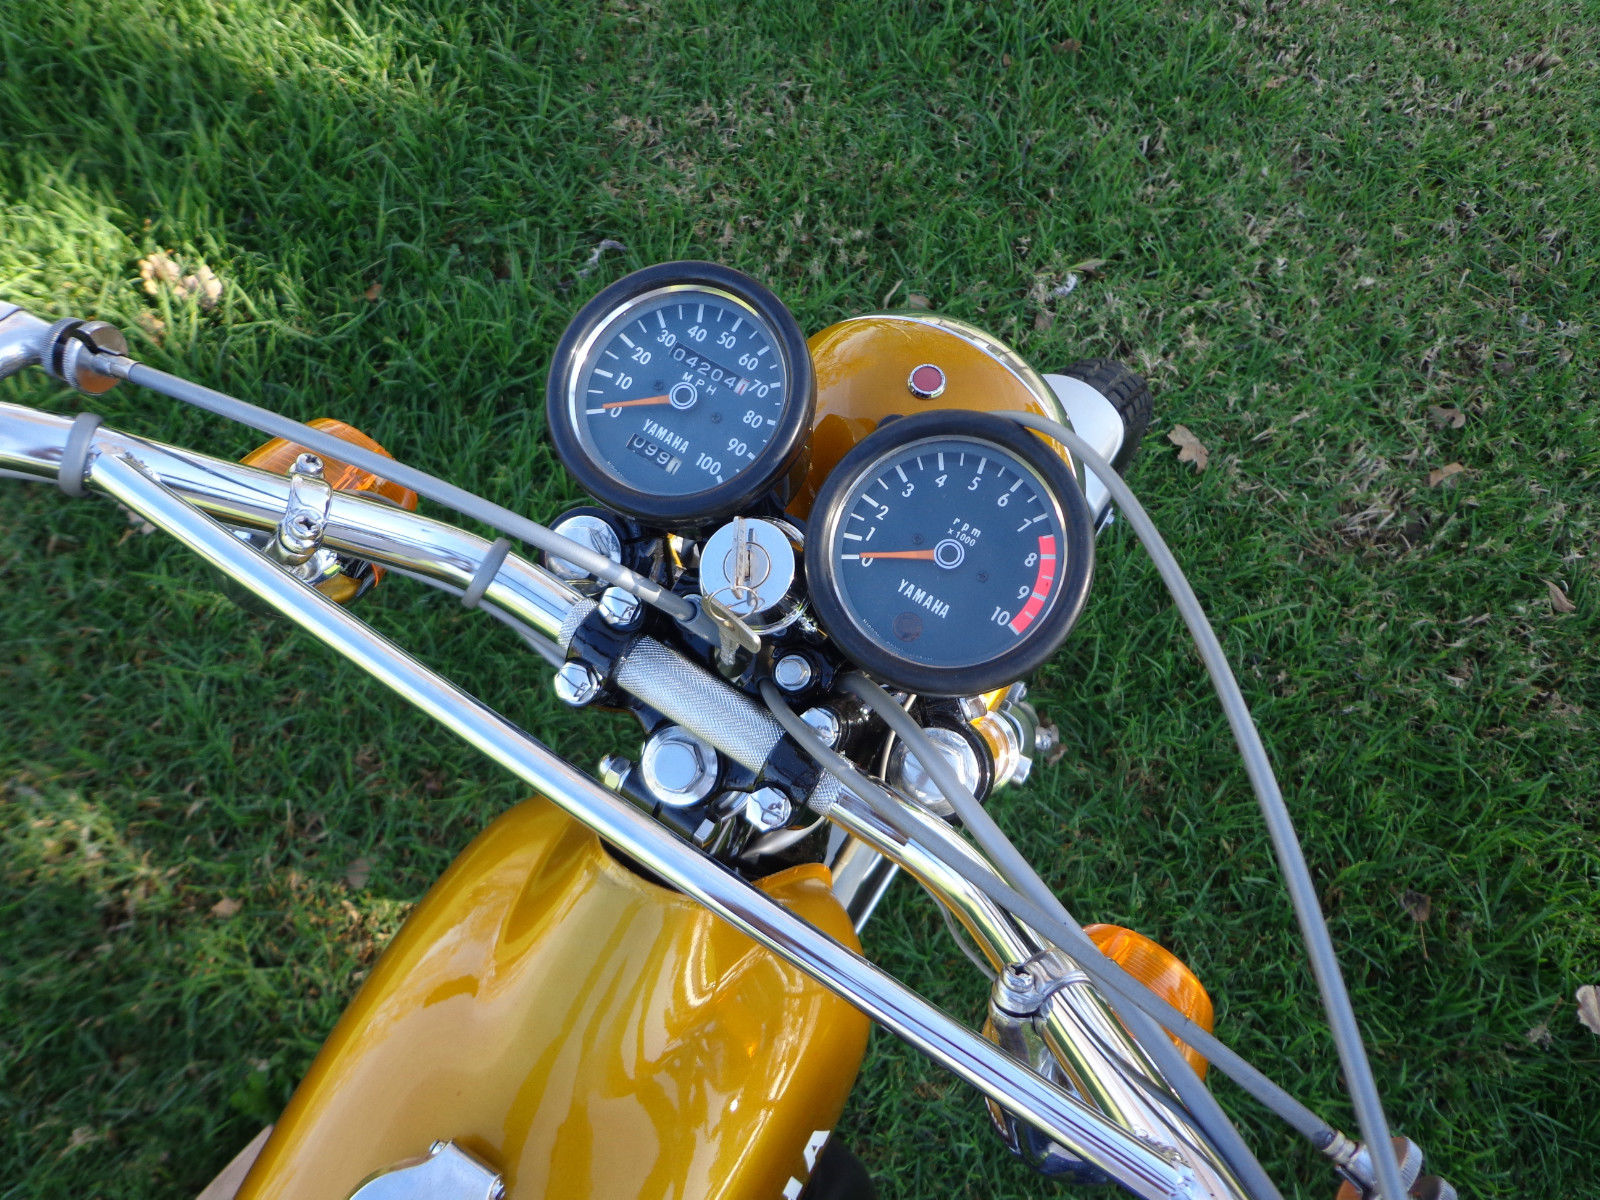 Yamaha DT250 - 1972 - Ignition Switch, Clocks, Speedo, Tacho and Handlebar.